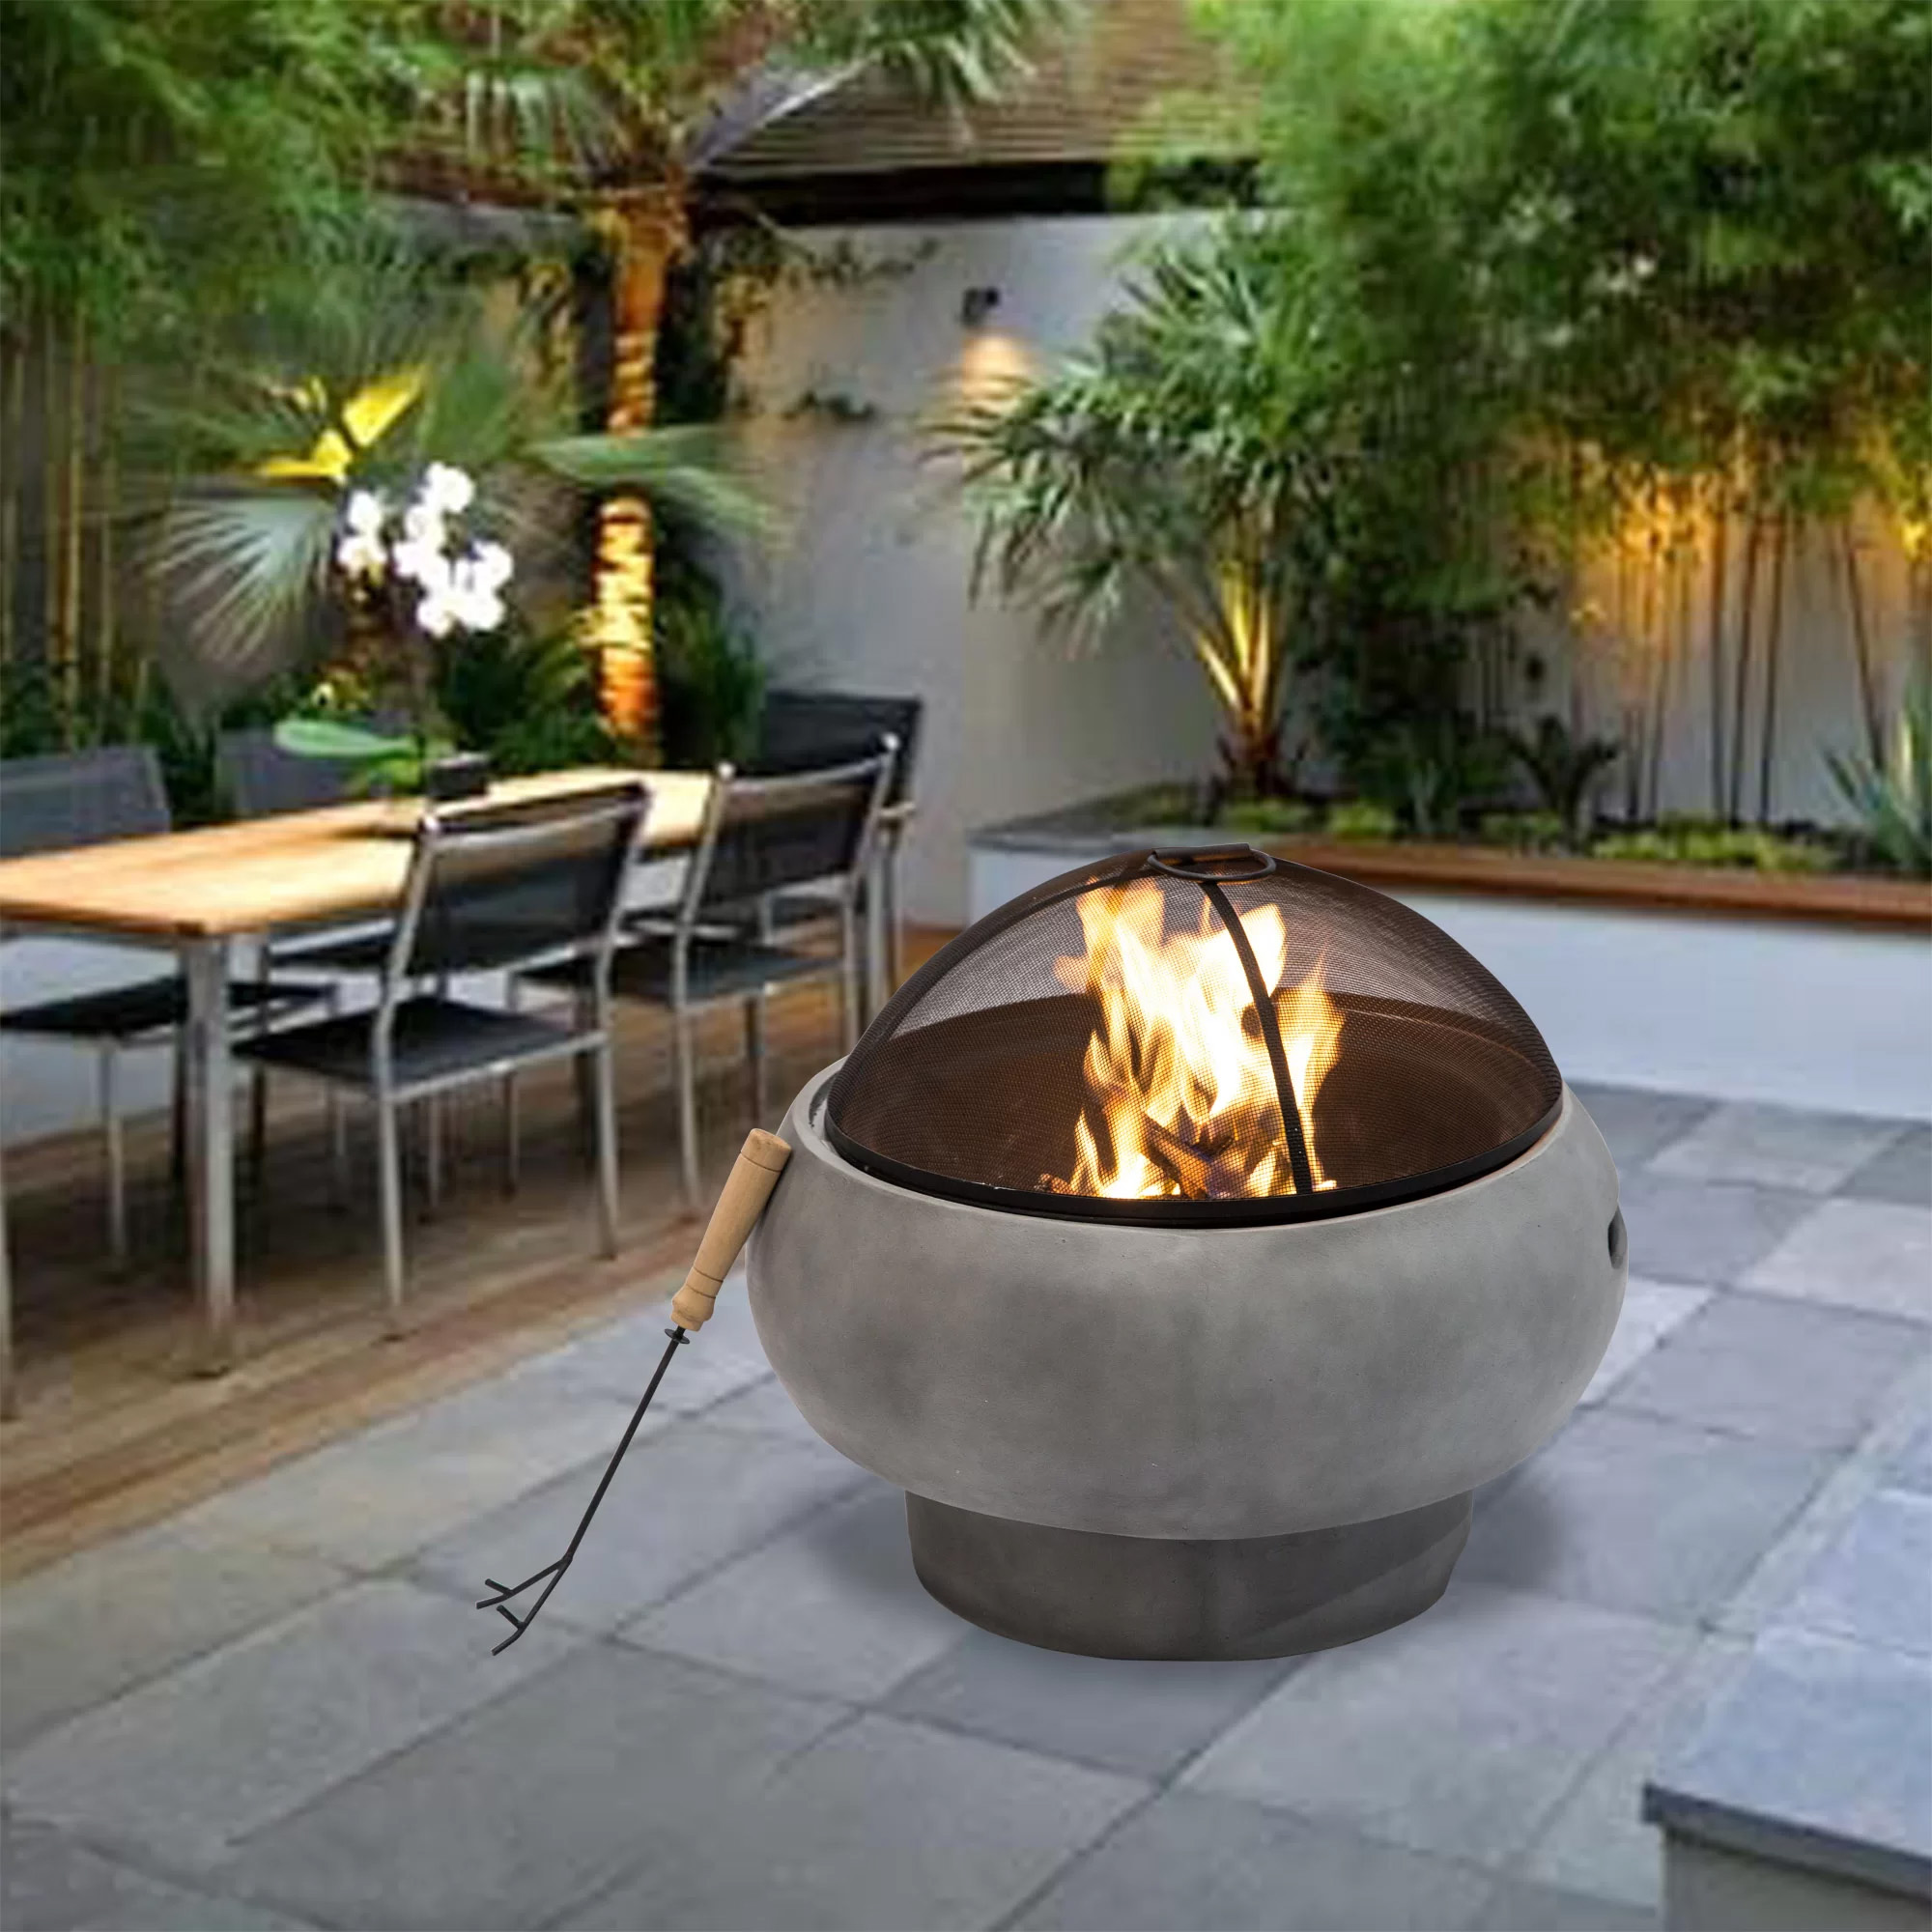 A Fire Pit For Cozy Conversation